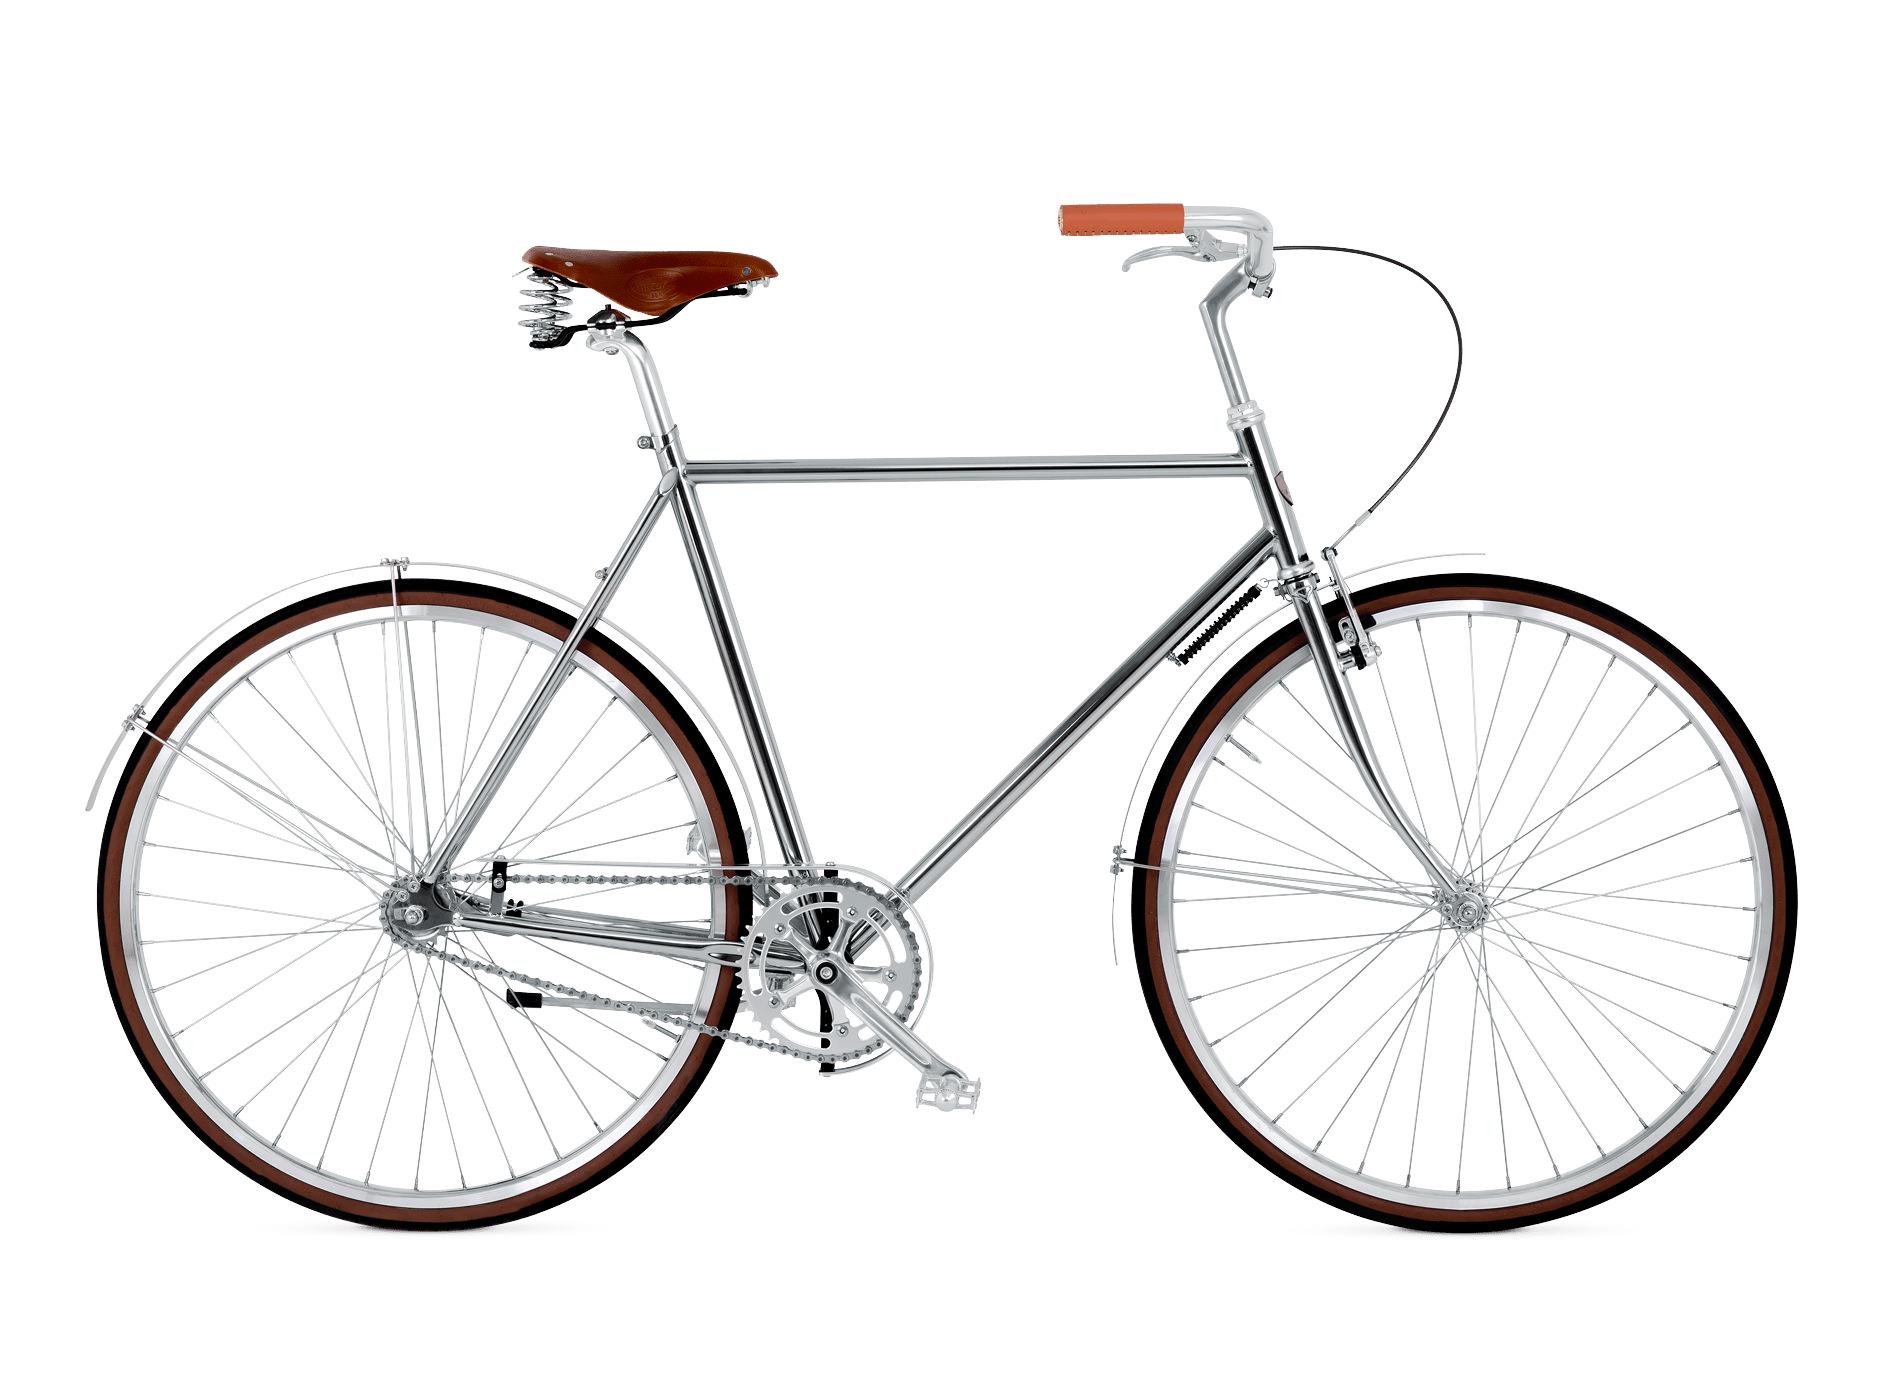 BIKEID Vélo Ville Premium Suédois Majestic Single Speed Chrome